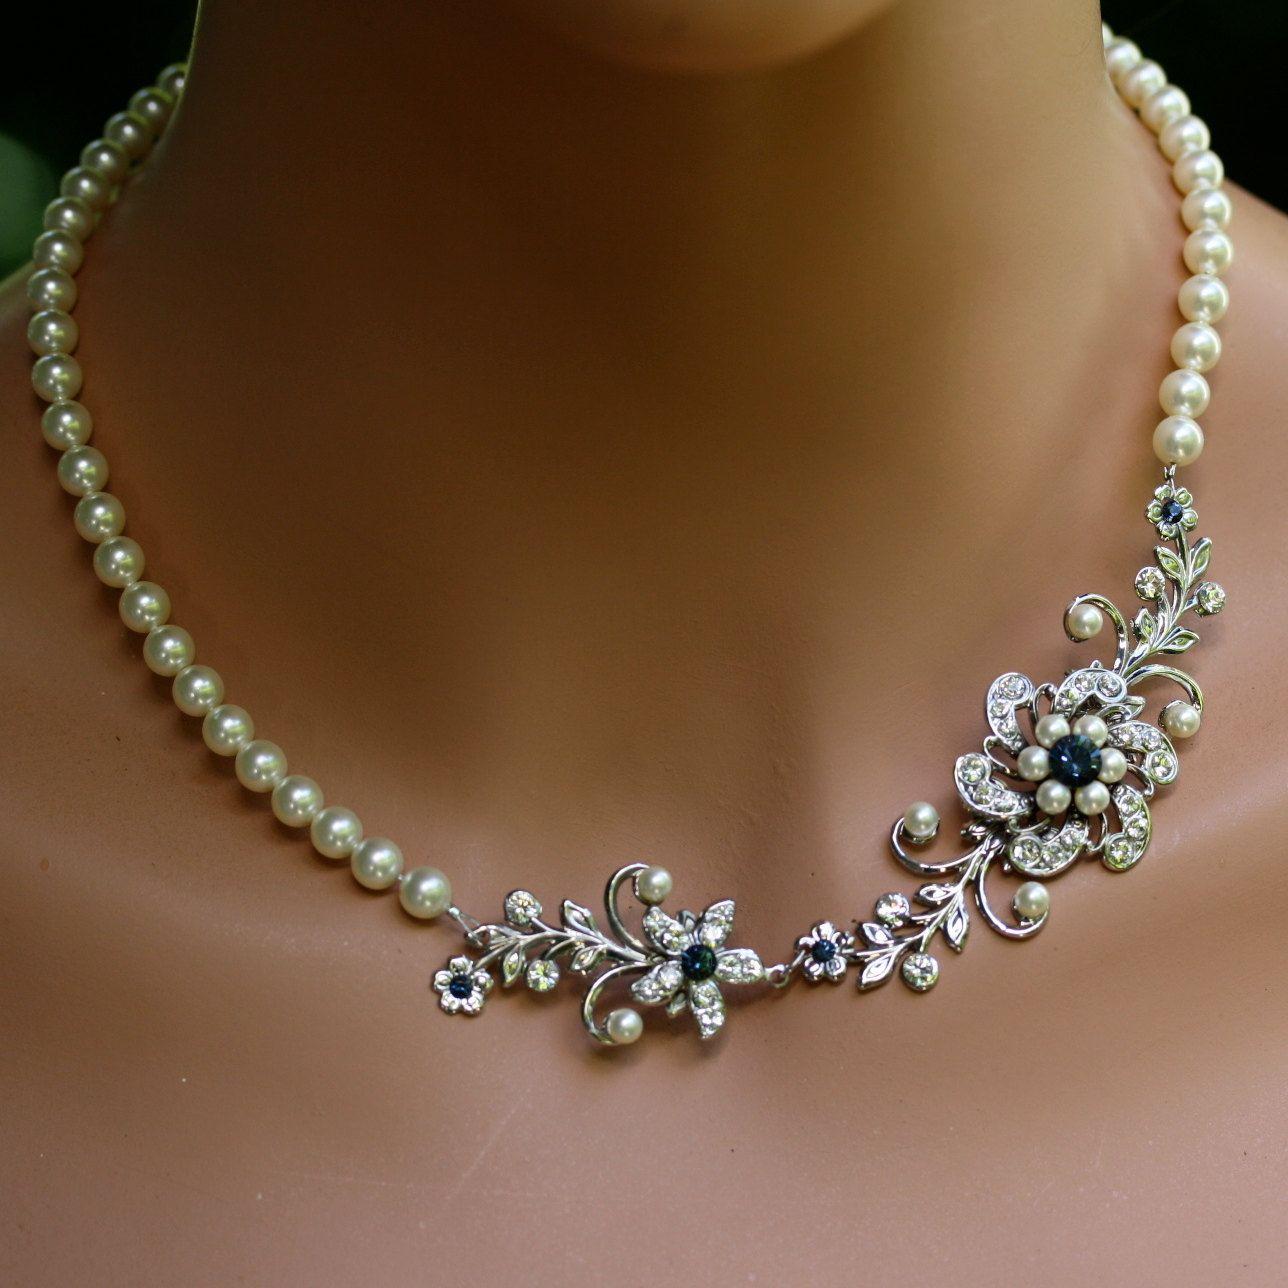 Bridal Flower Bracelet : Pearl wedding bracelet swarovski crystal flower